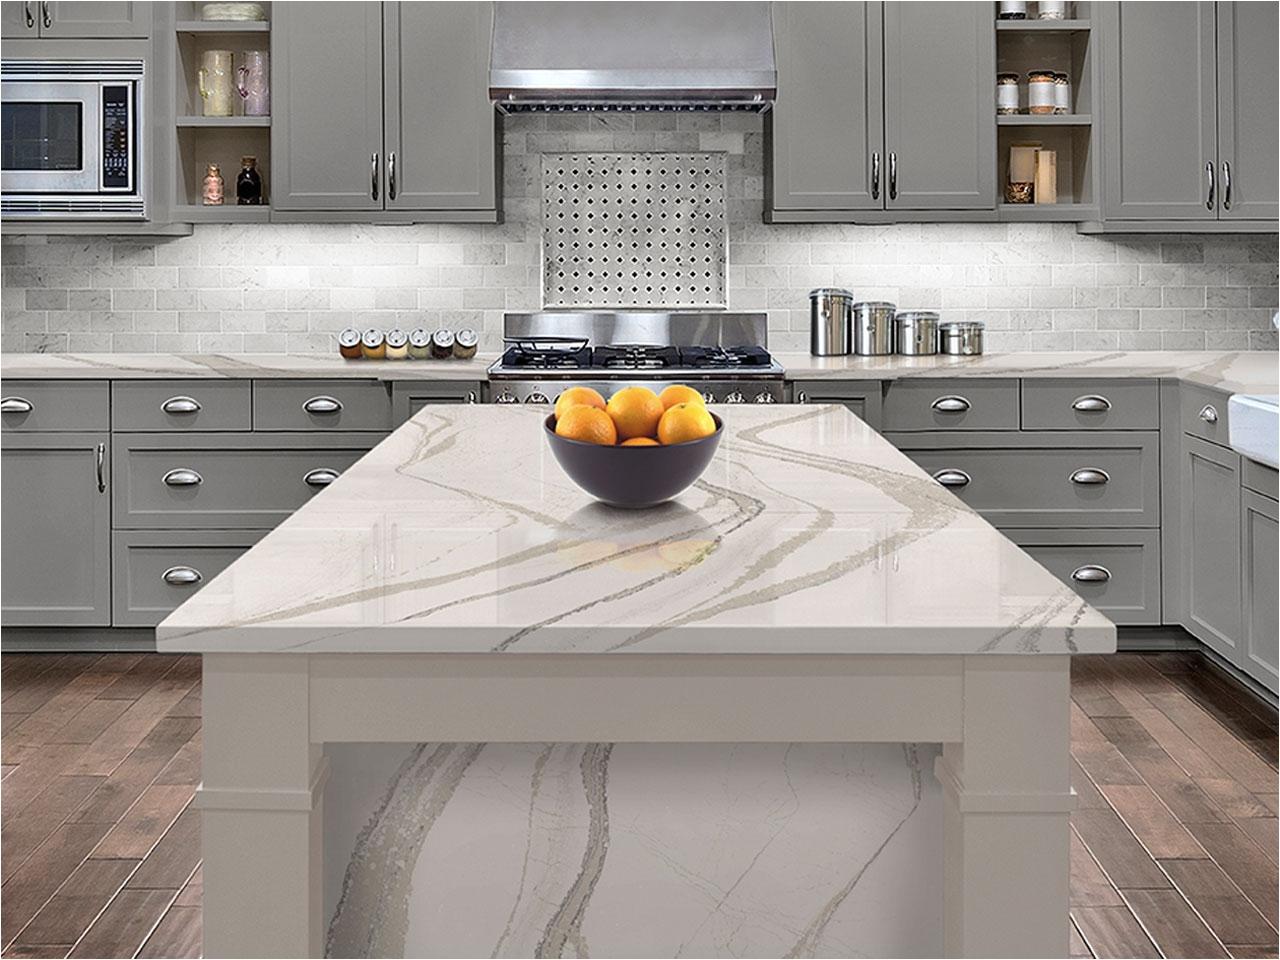 Floor and Decor Stone Countertops La Design Construction Bathroom Kitchen Remodeling Contractor